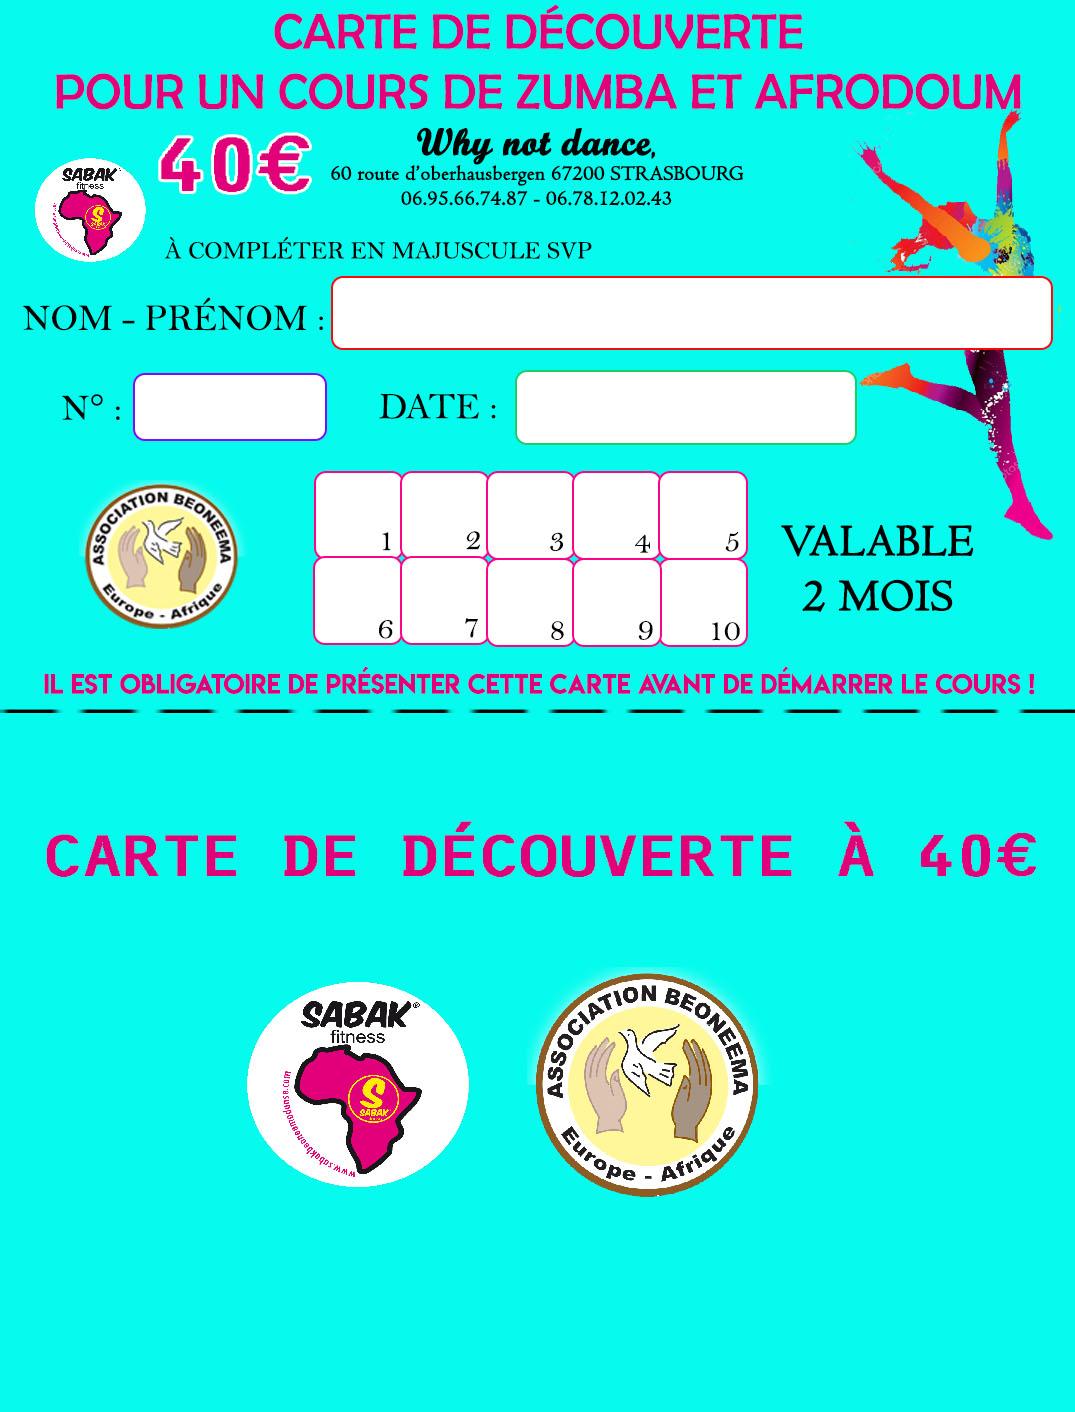 CARTE DE DÉCOUVERTE POUR UN COURS DE ZUMBA &/OU AFRO DOUM